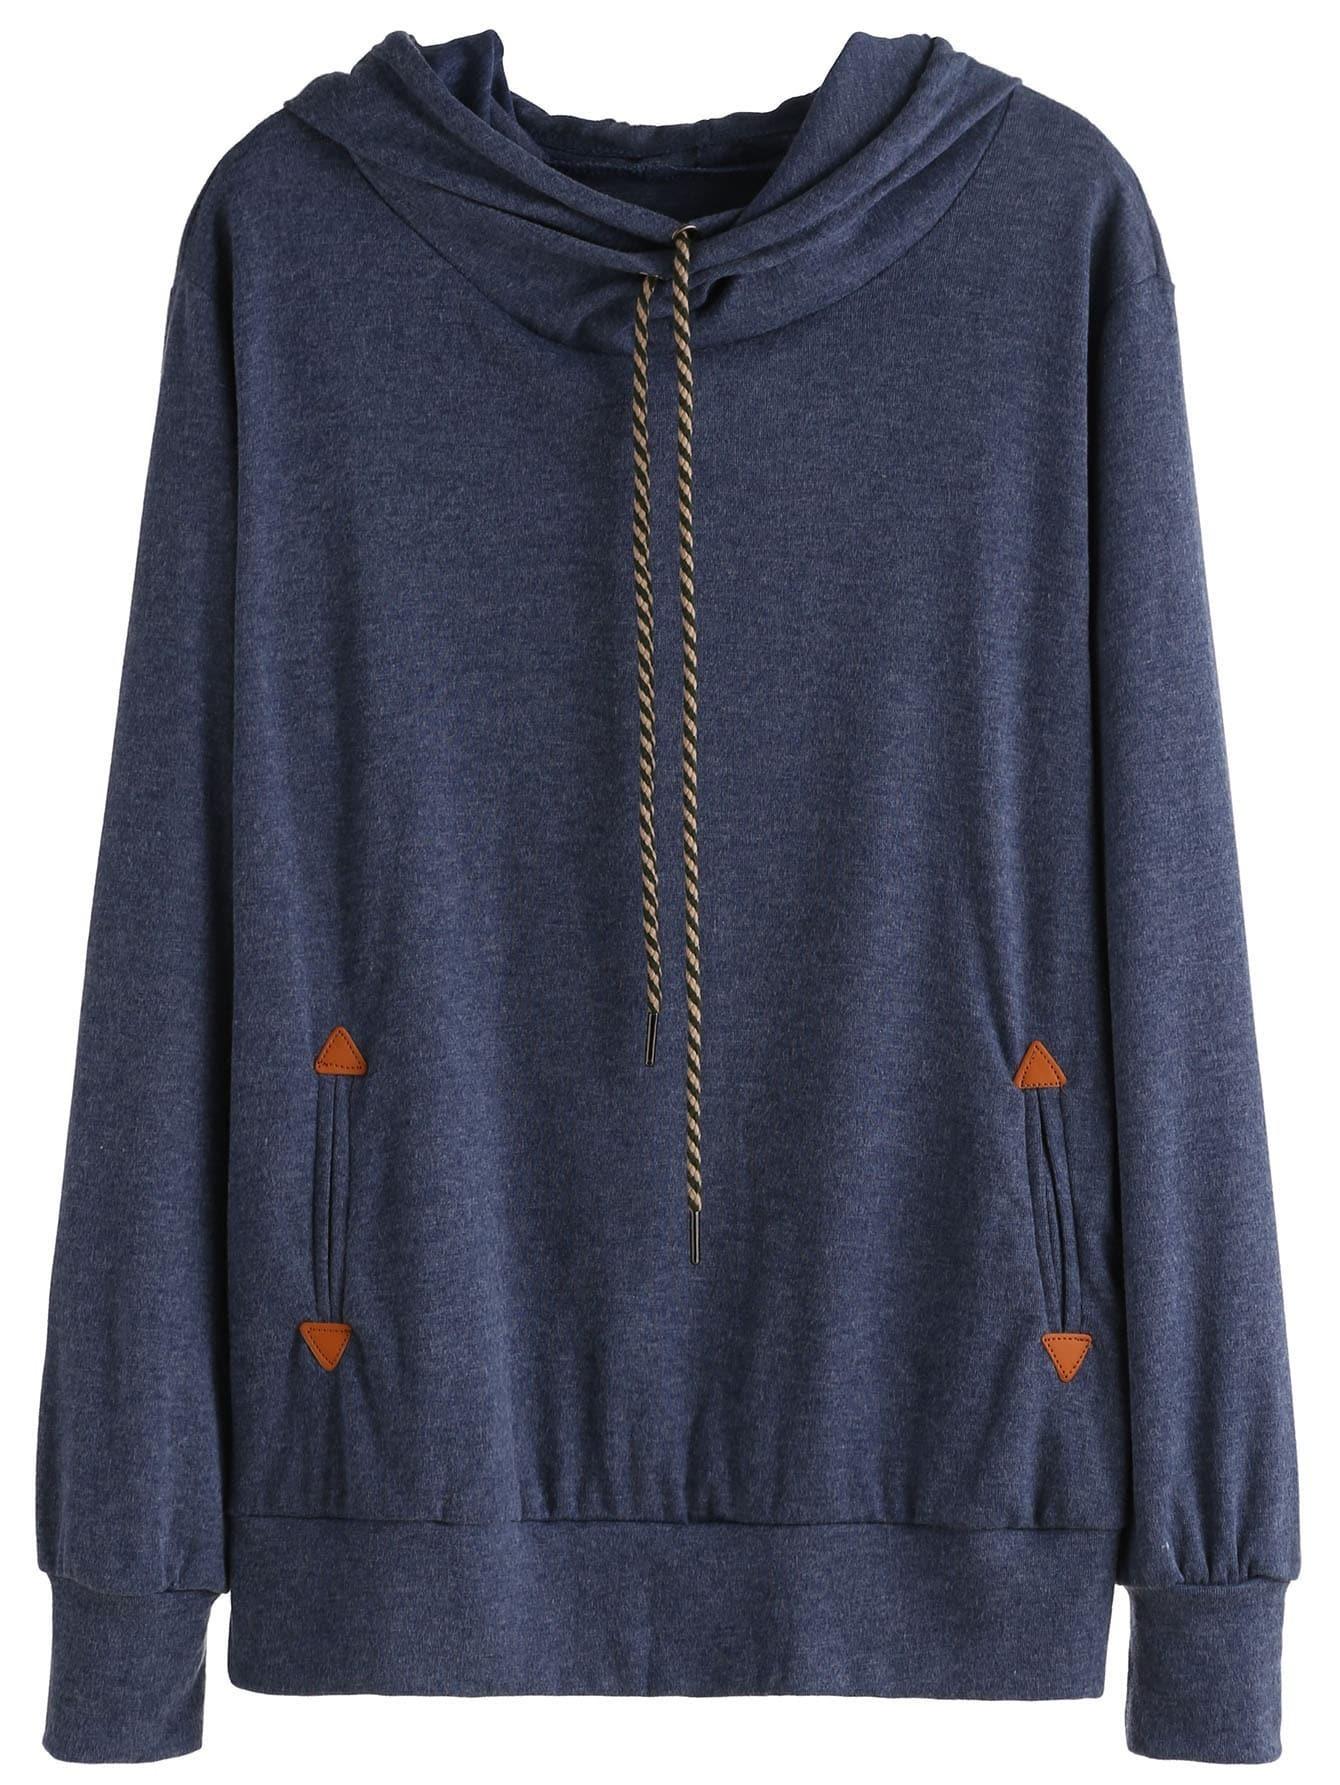 Blue Drawstring Hooded Sweatshirt RSWE160906004